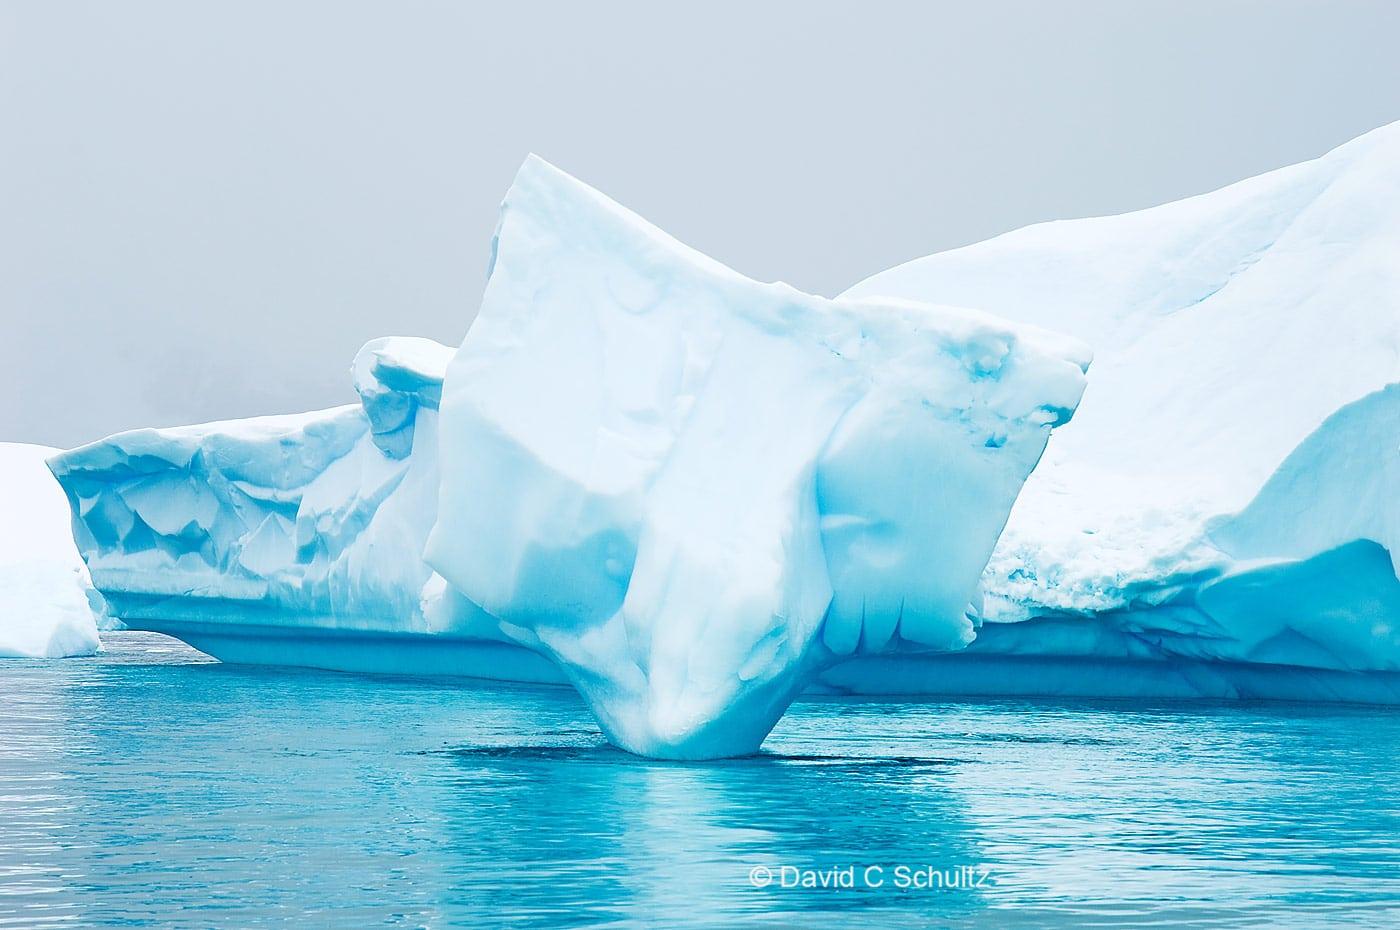 Iceberg in Antarctica - Image #167-388